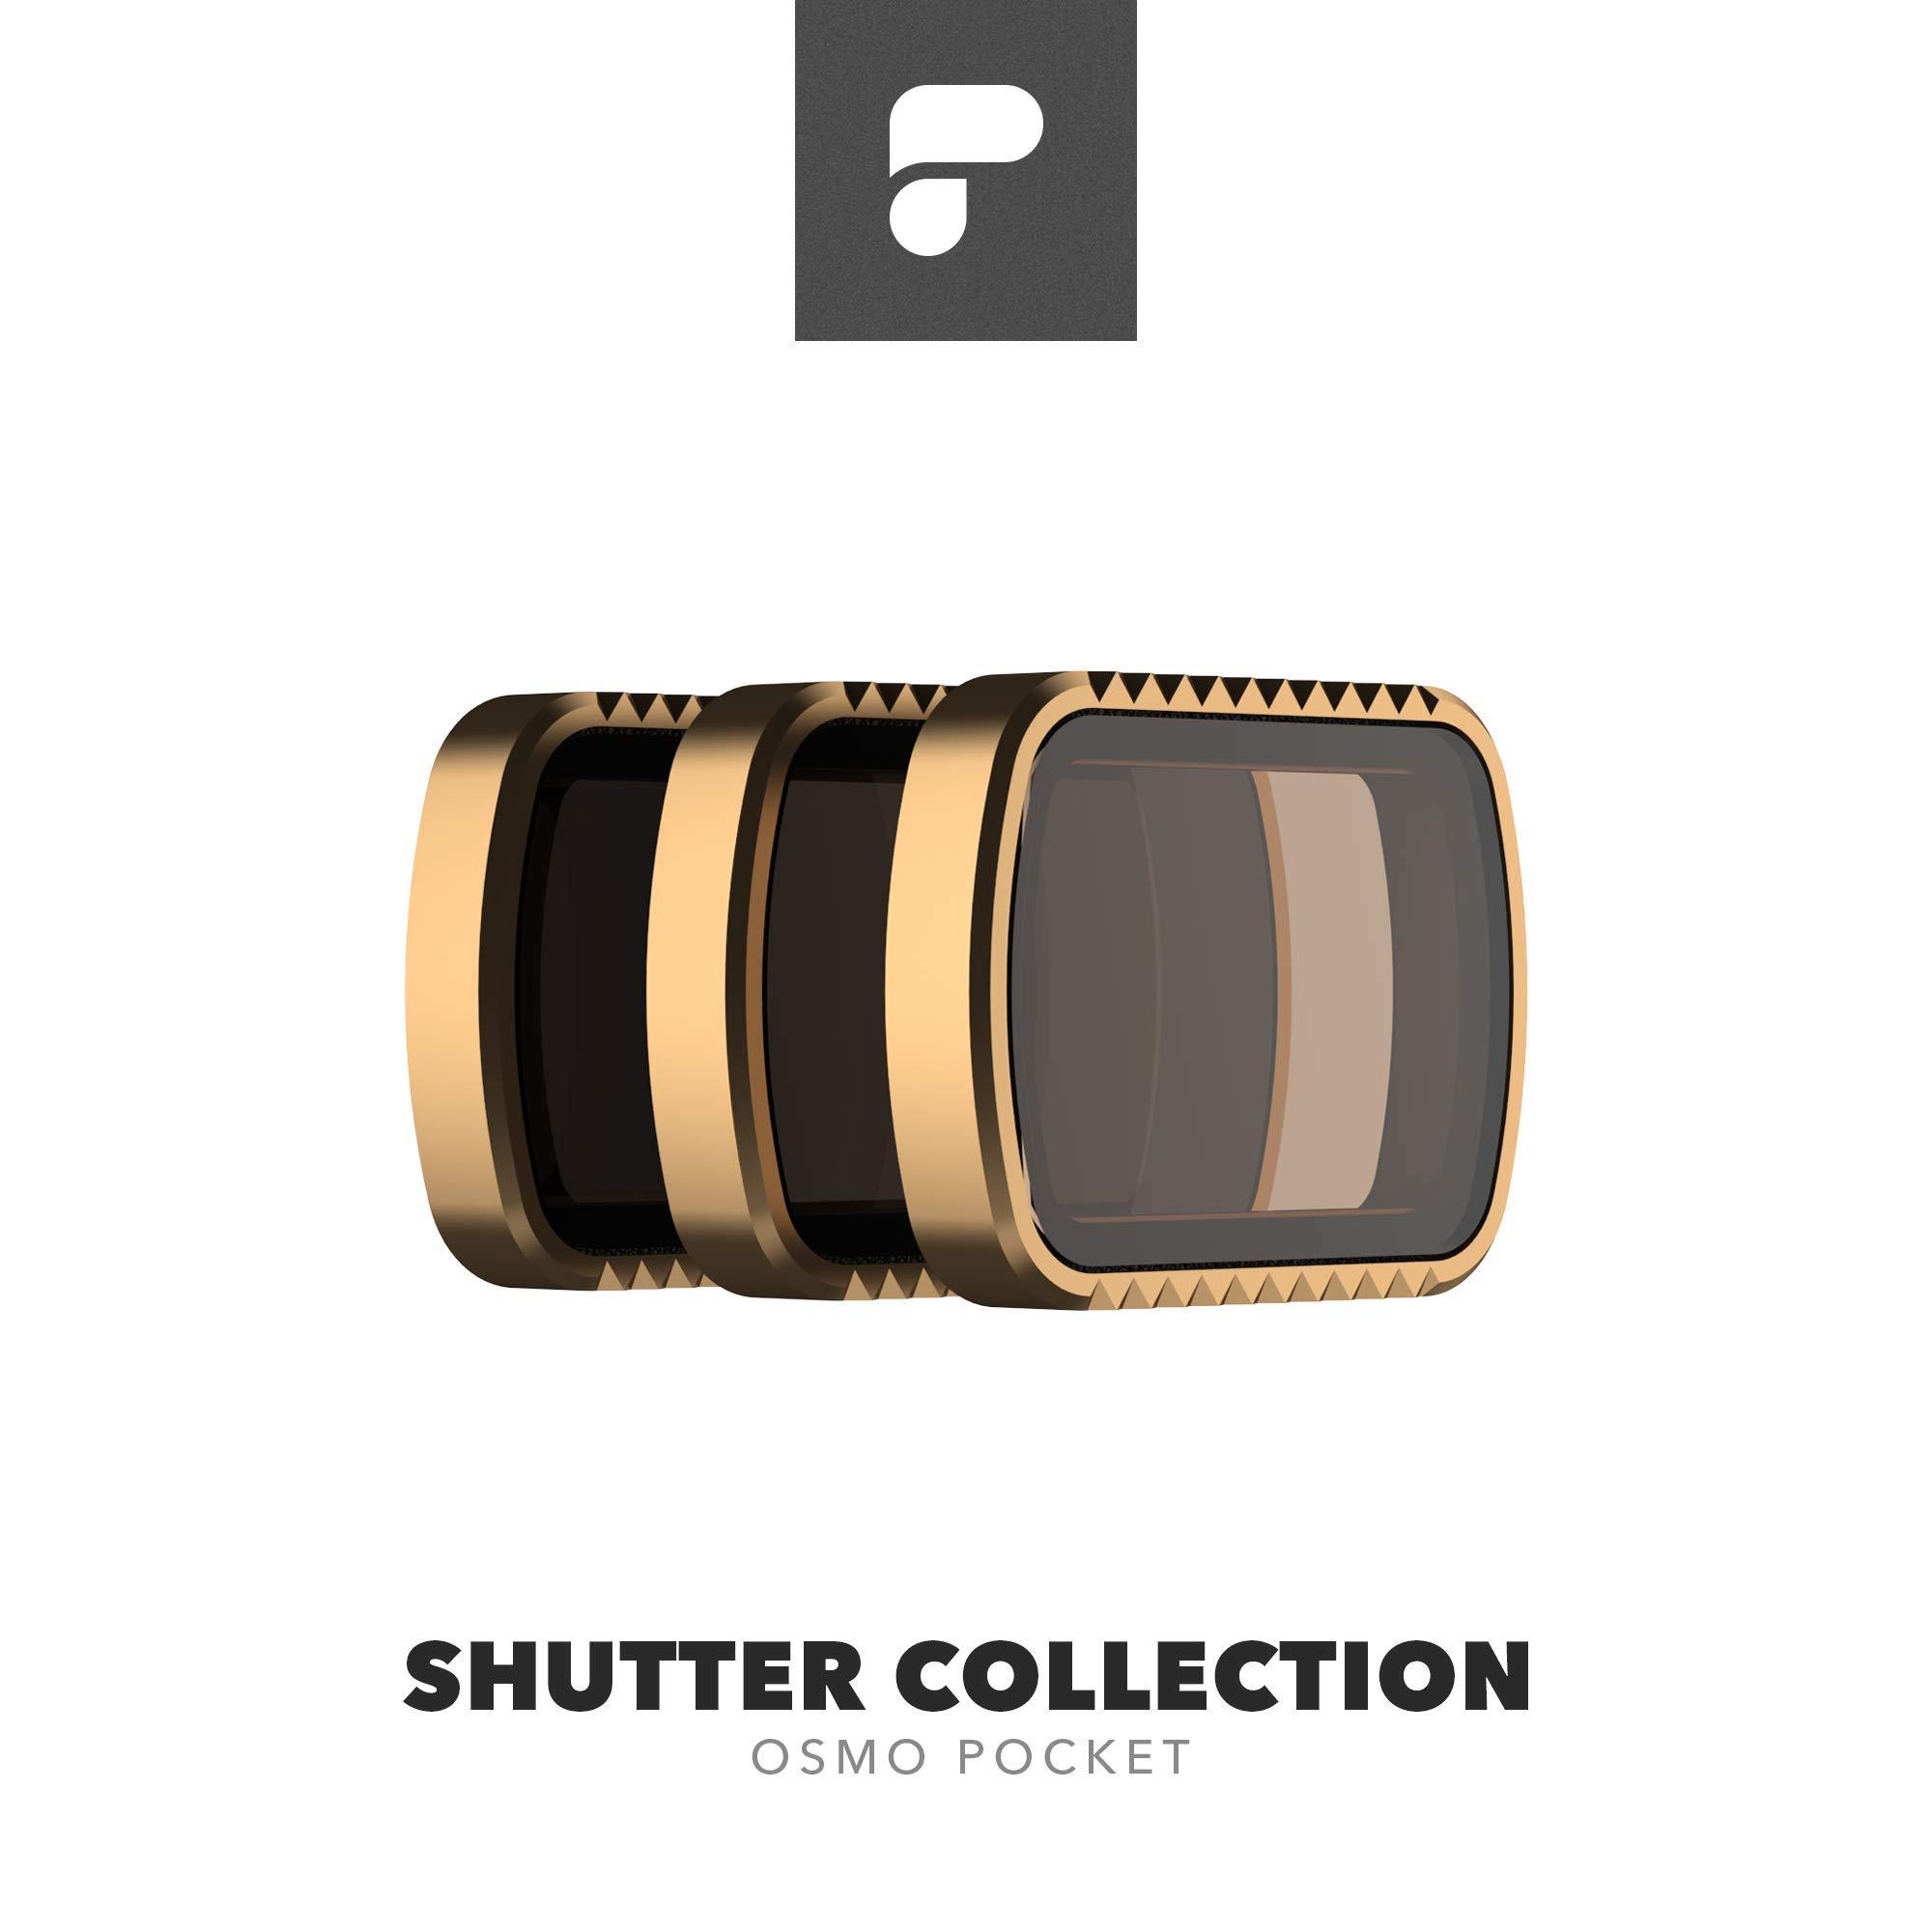 PolarPro Cinema Series Filter 3-Pack - Shutter Collection for DJI Osmo Pocket